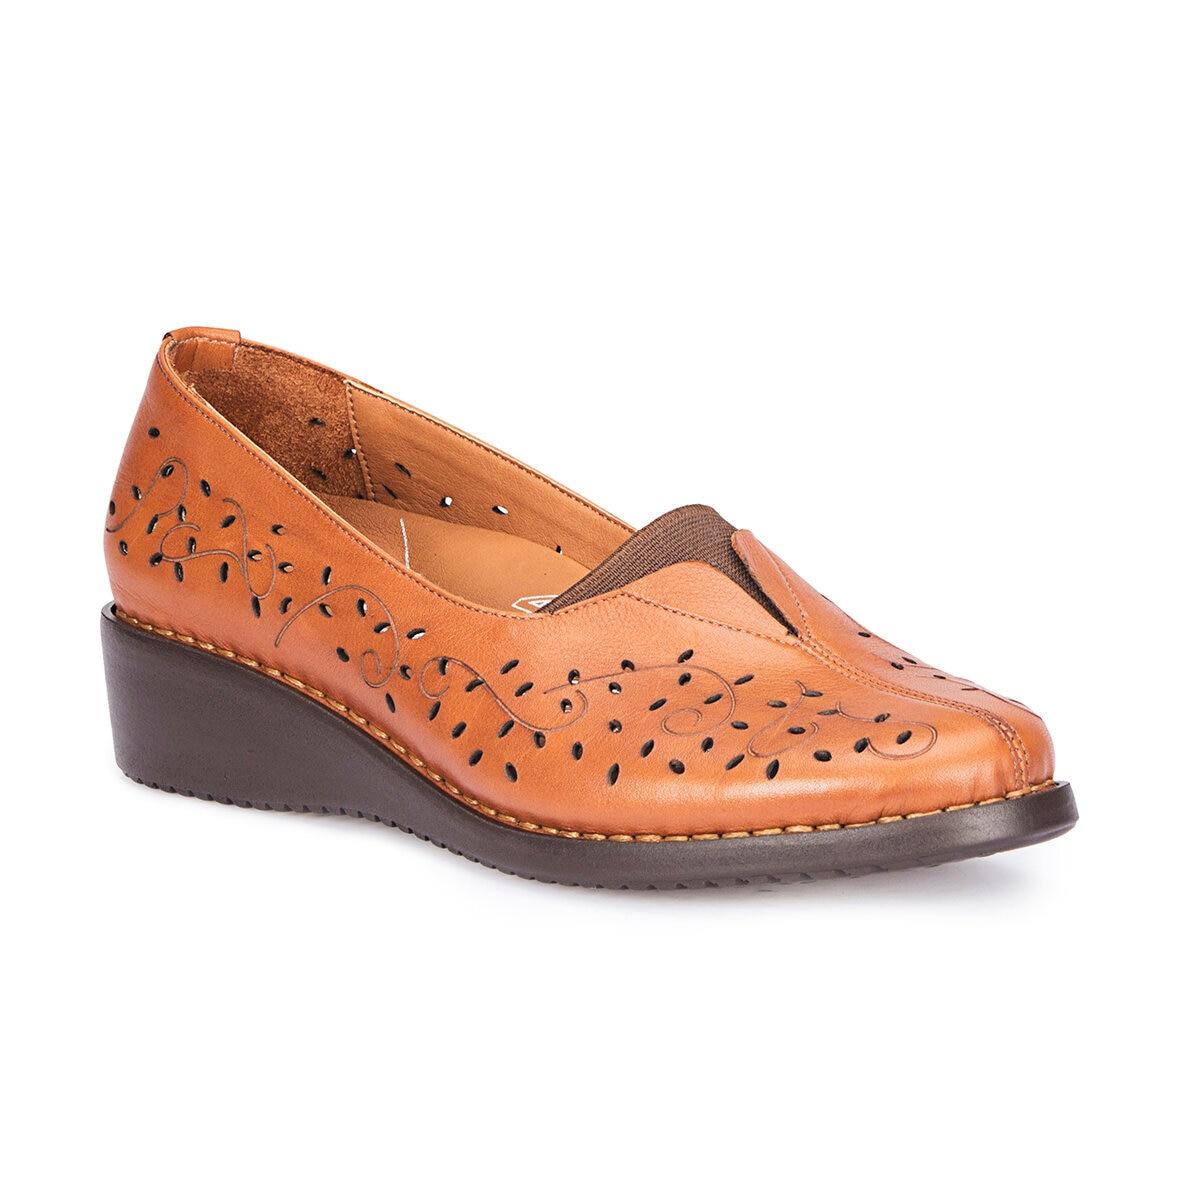 FLO 71. 109651.Z Tan Women 'S Wedges Shoes Polaris 5 Point